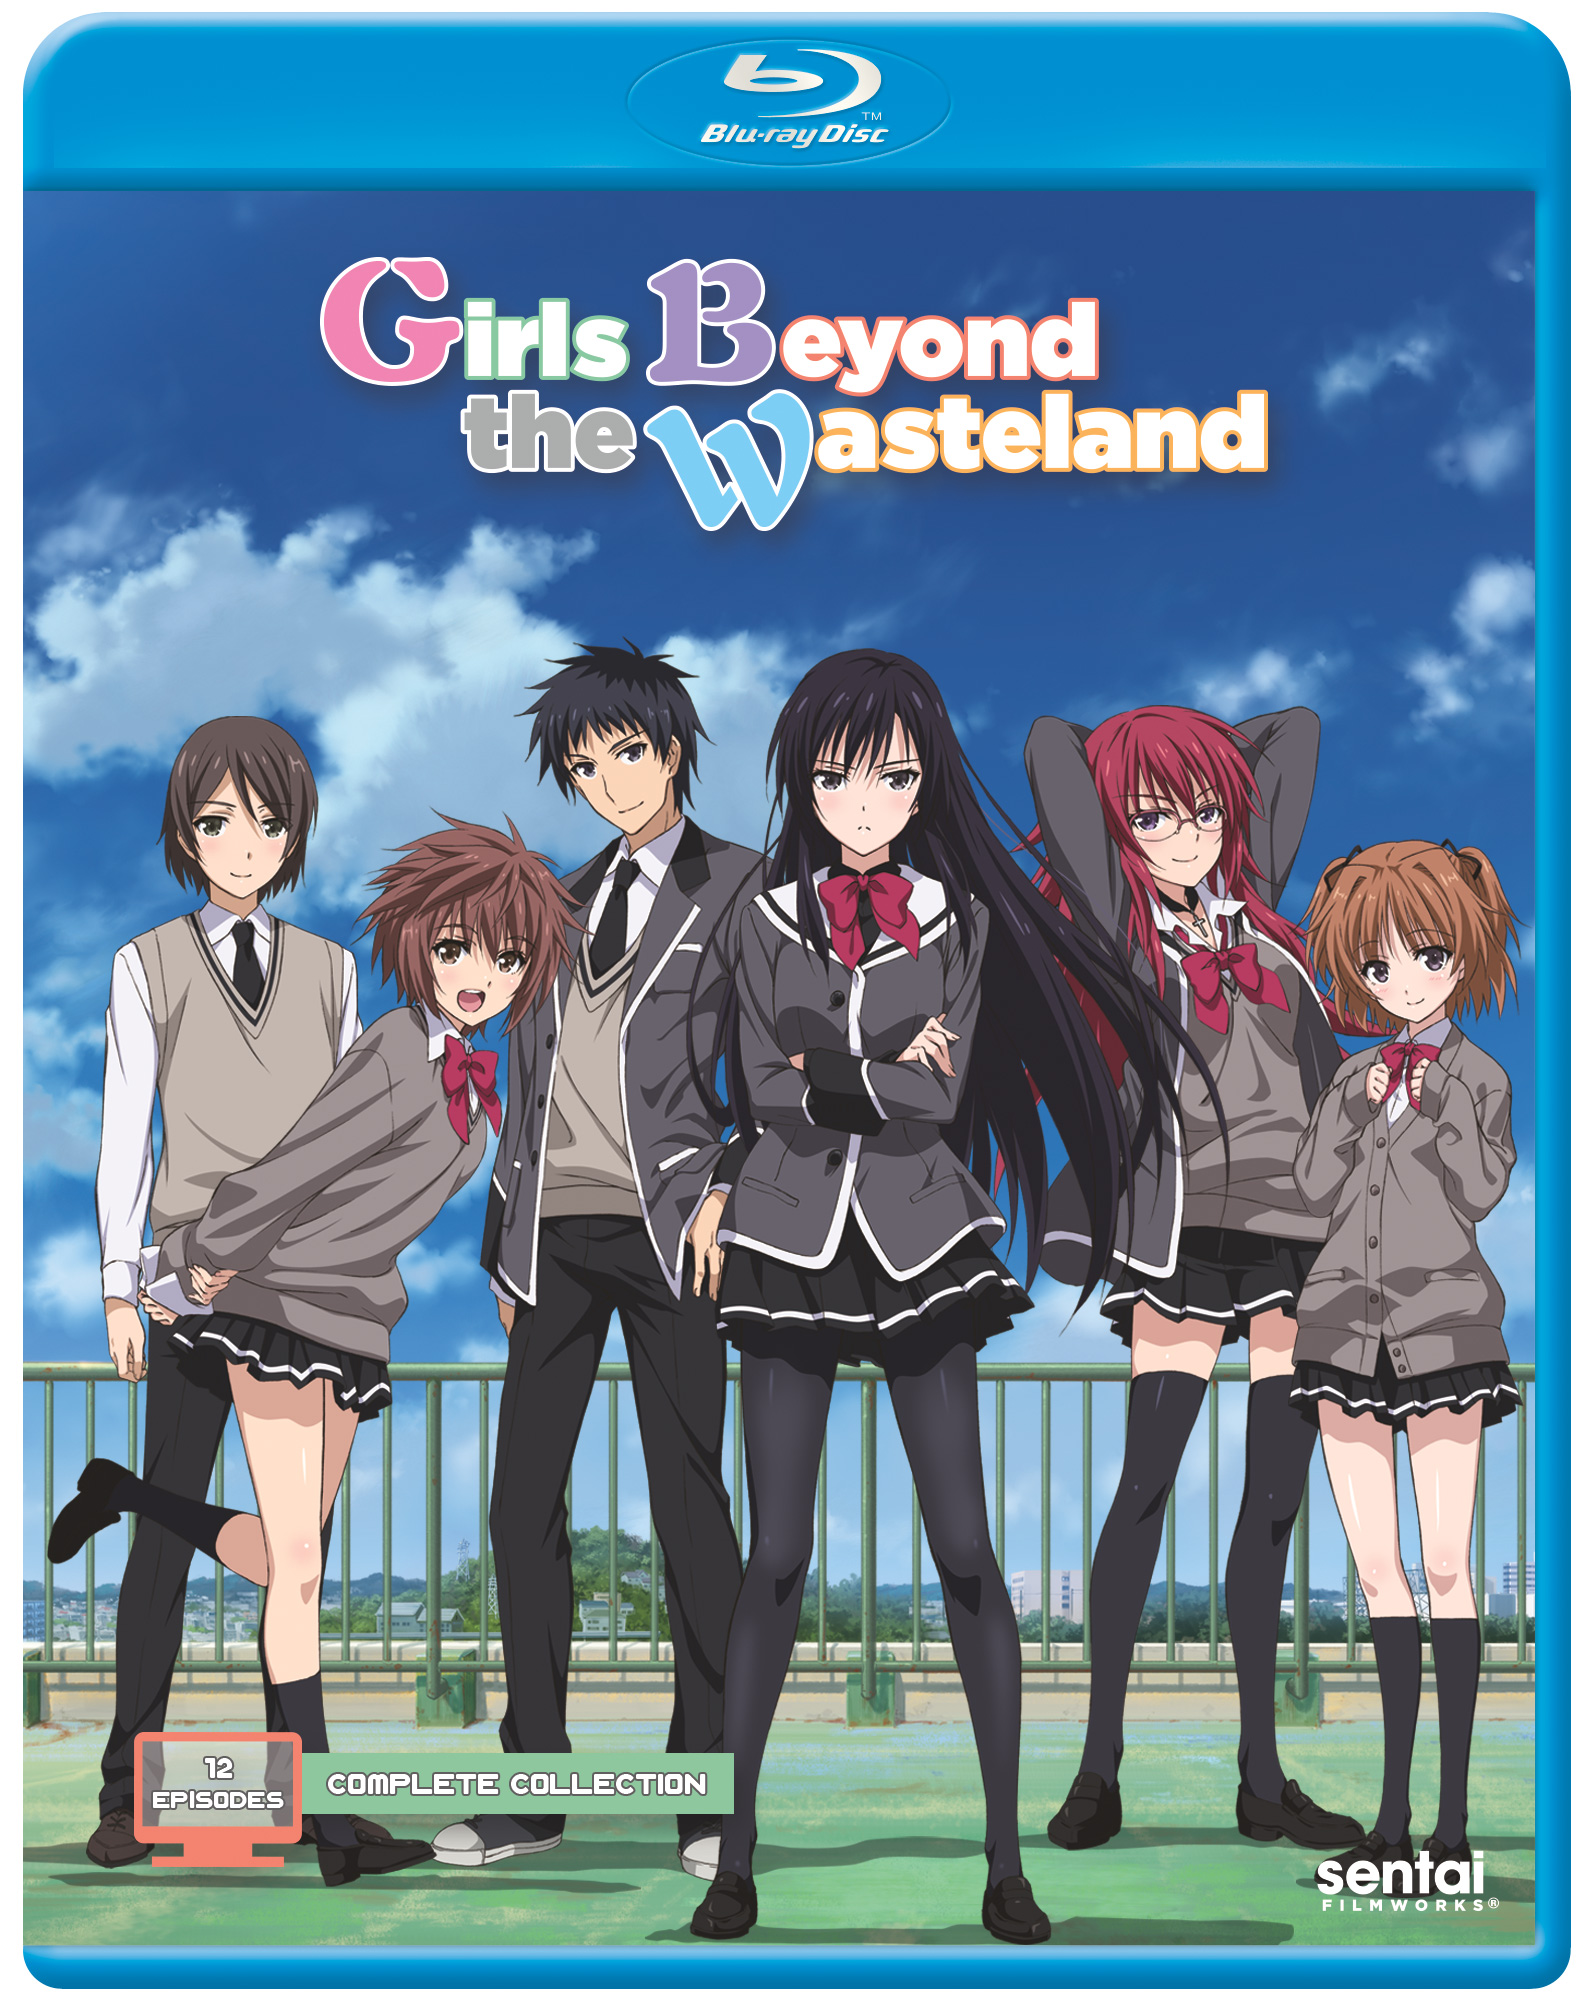 Girls Beyond the Wasteland Blu-ray